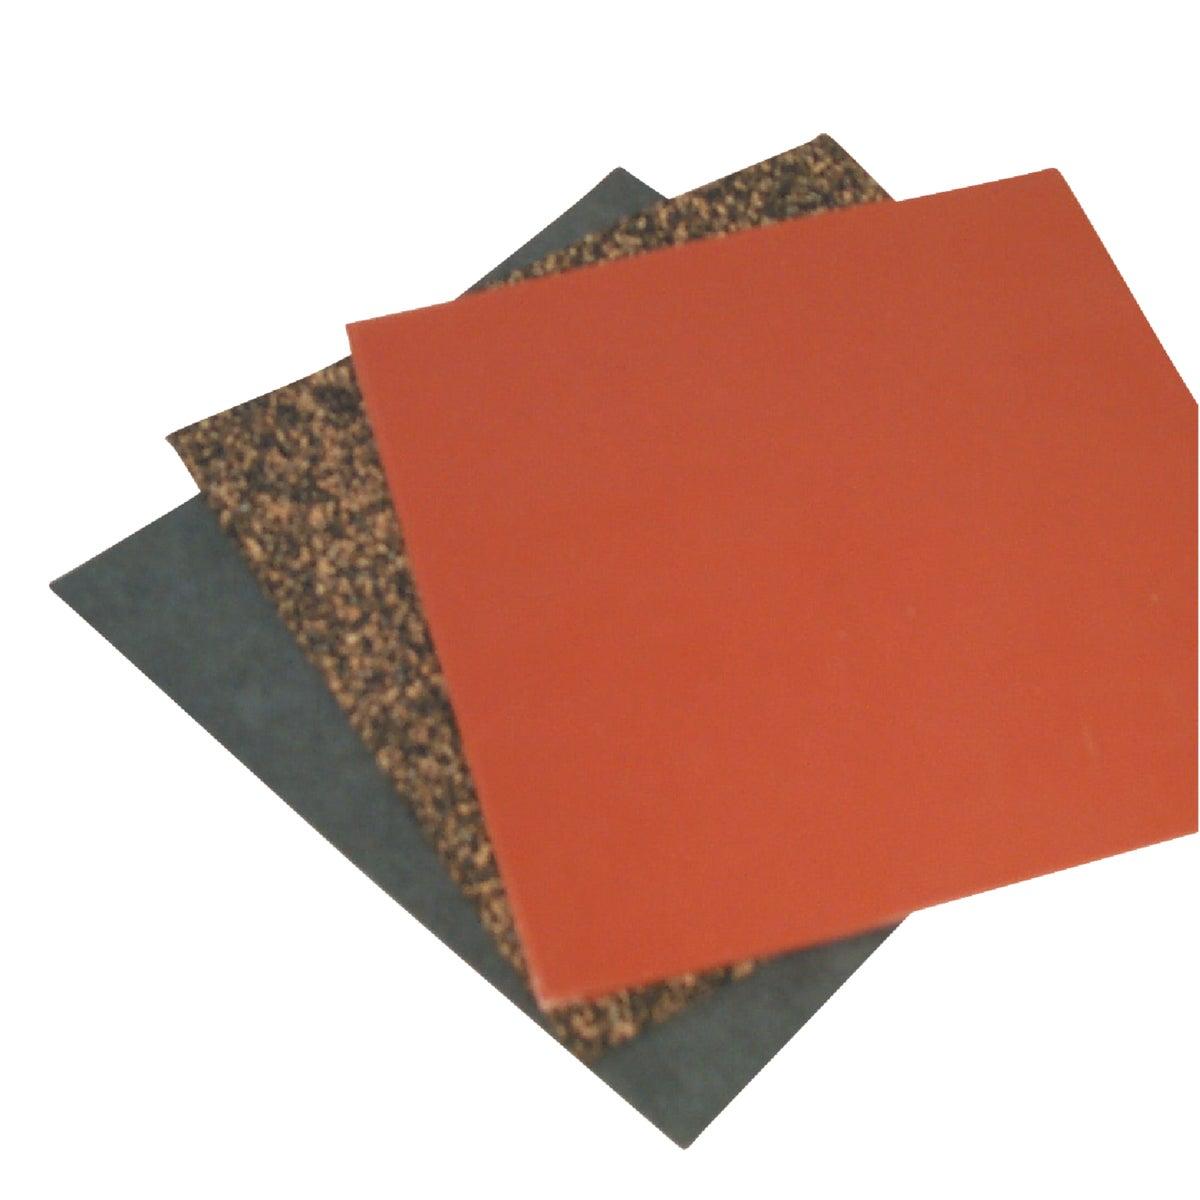 Gasket Material